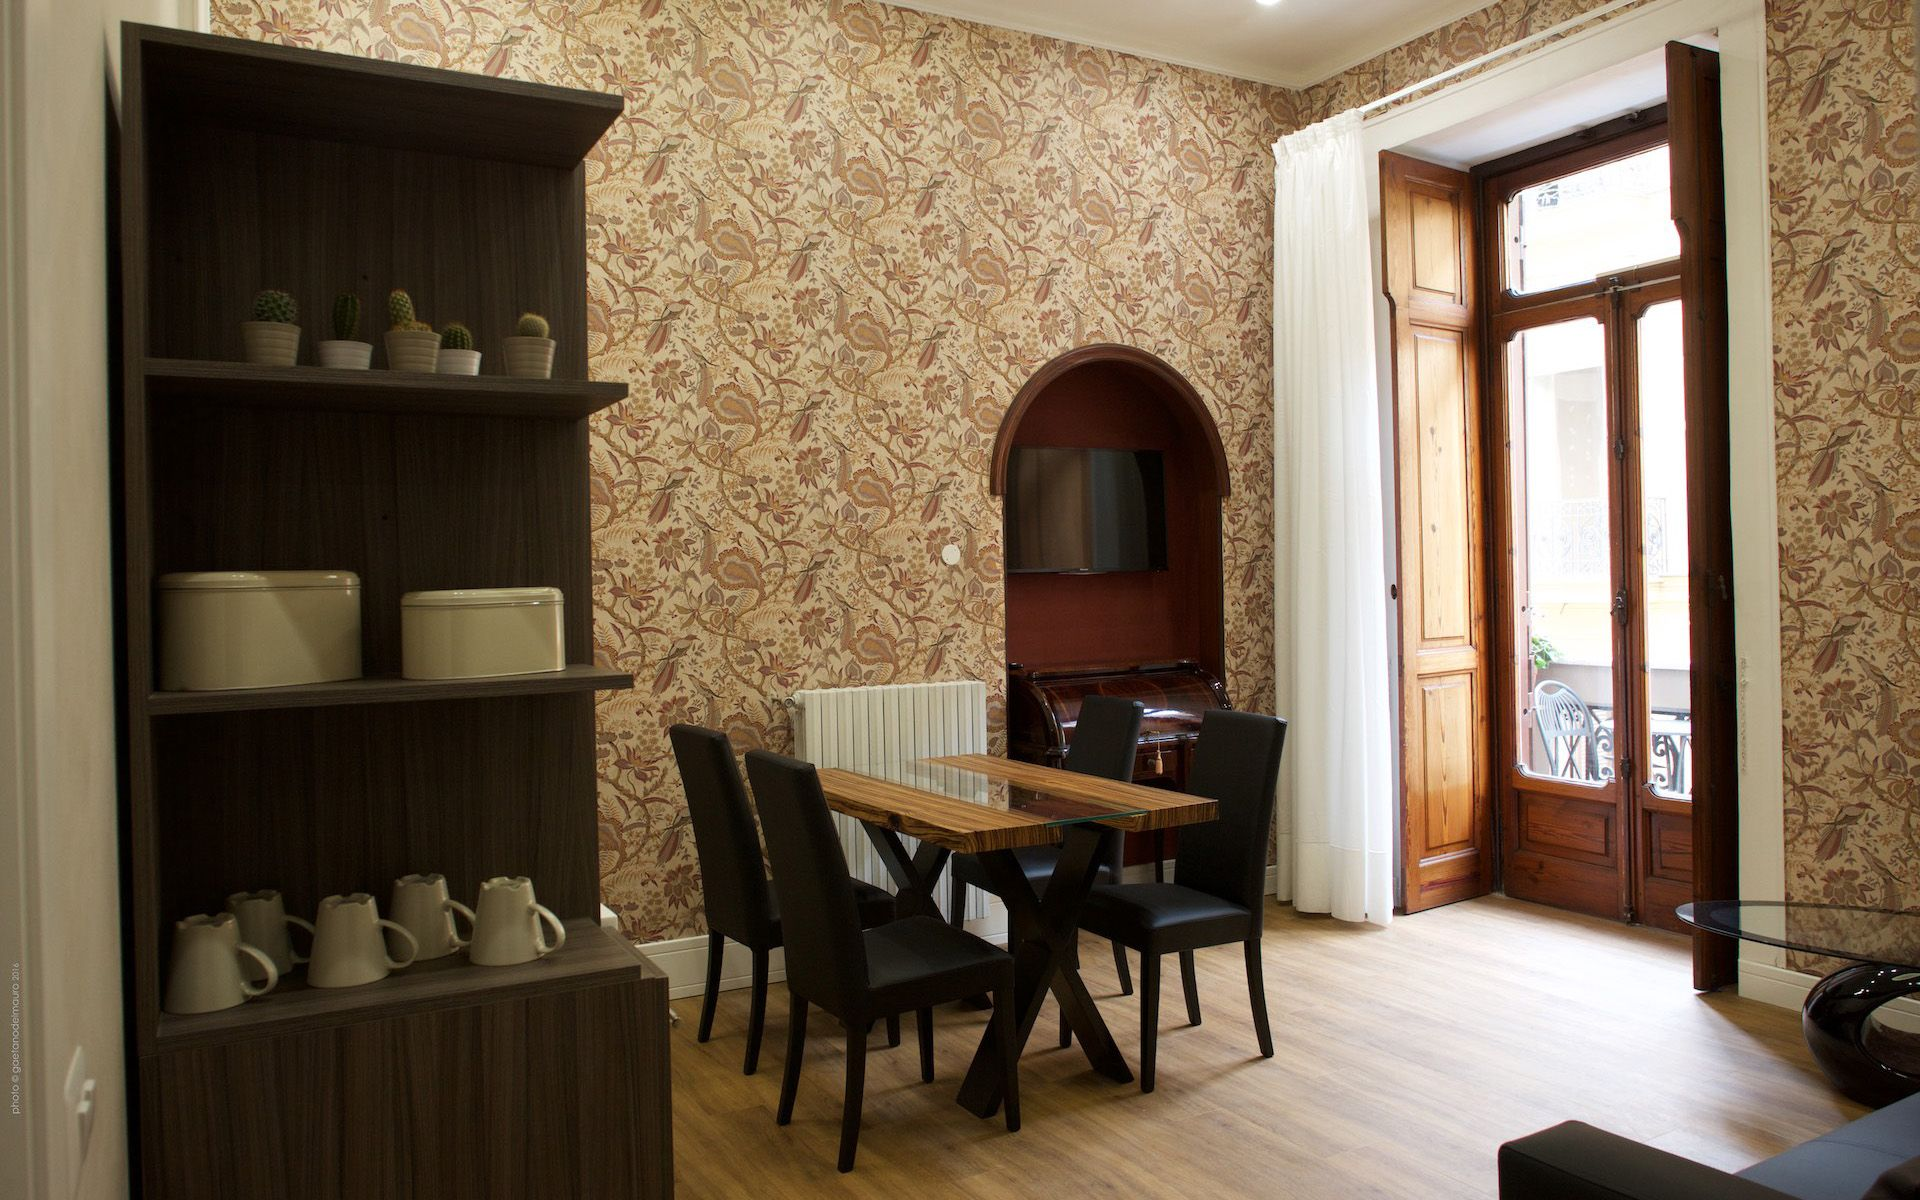 Un bed and breakfast in un palazzo nobiliare del 900